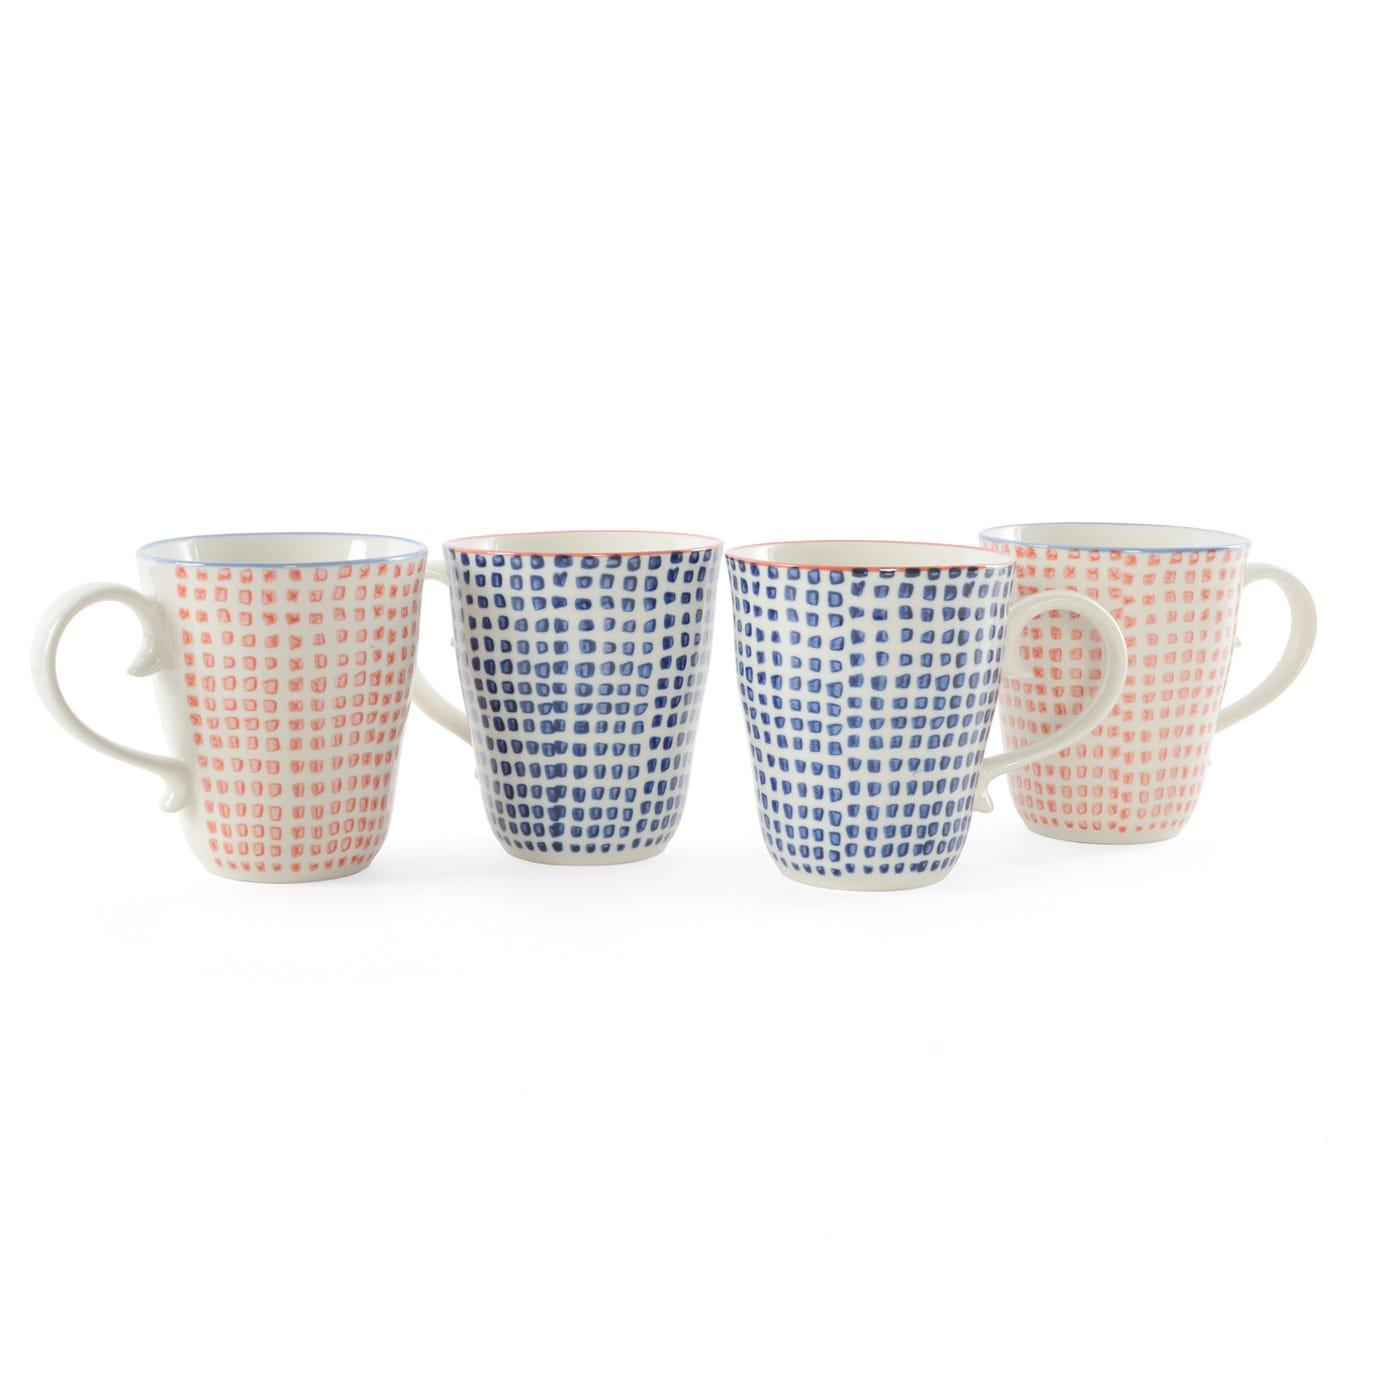 Block Mugs Assorted Set of 4